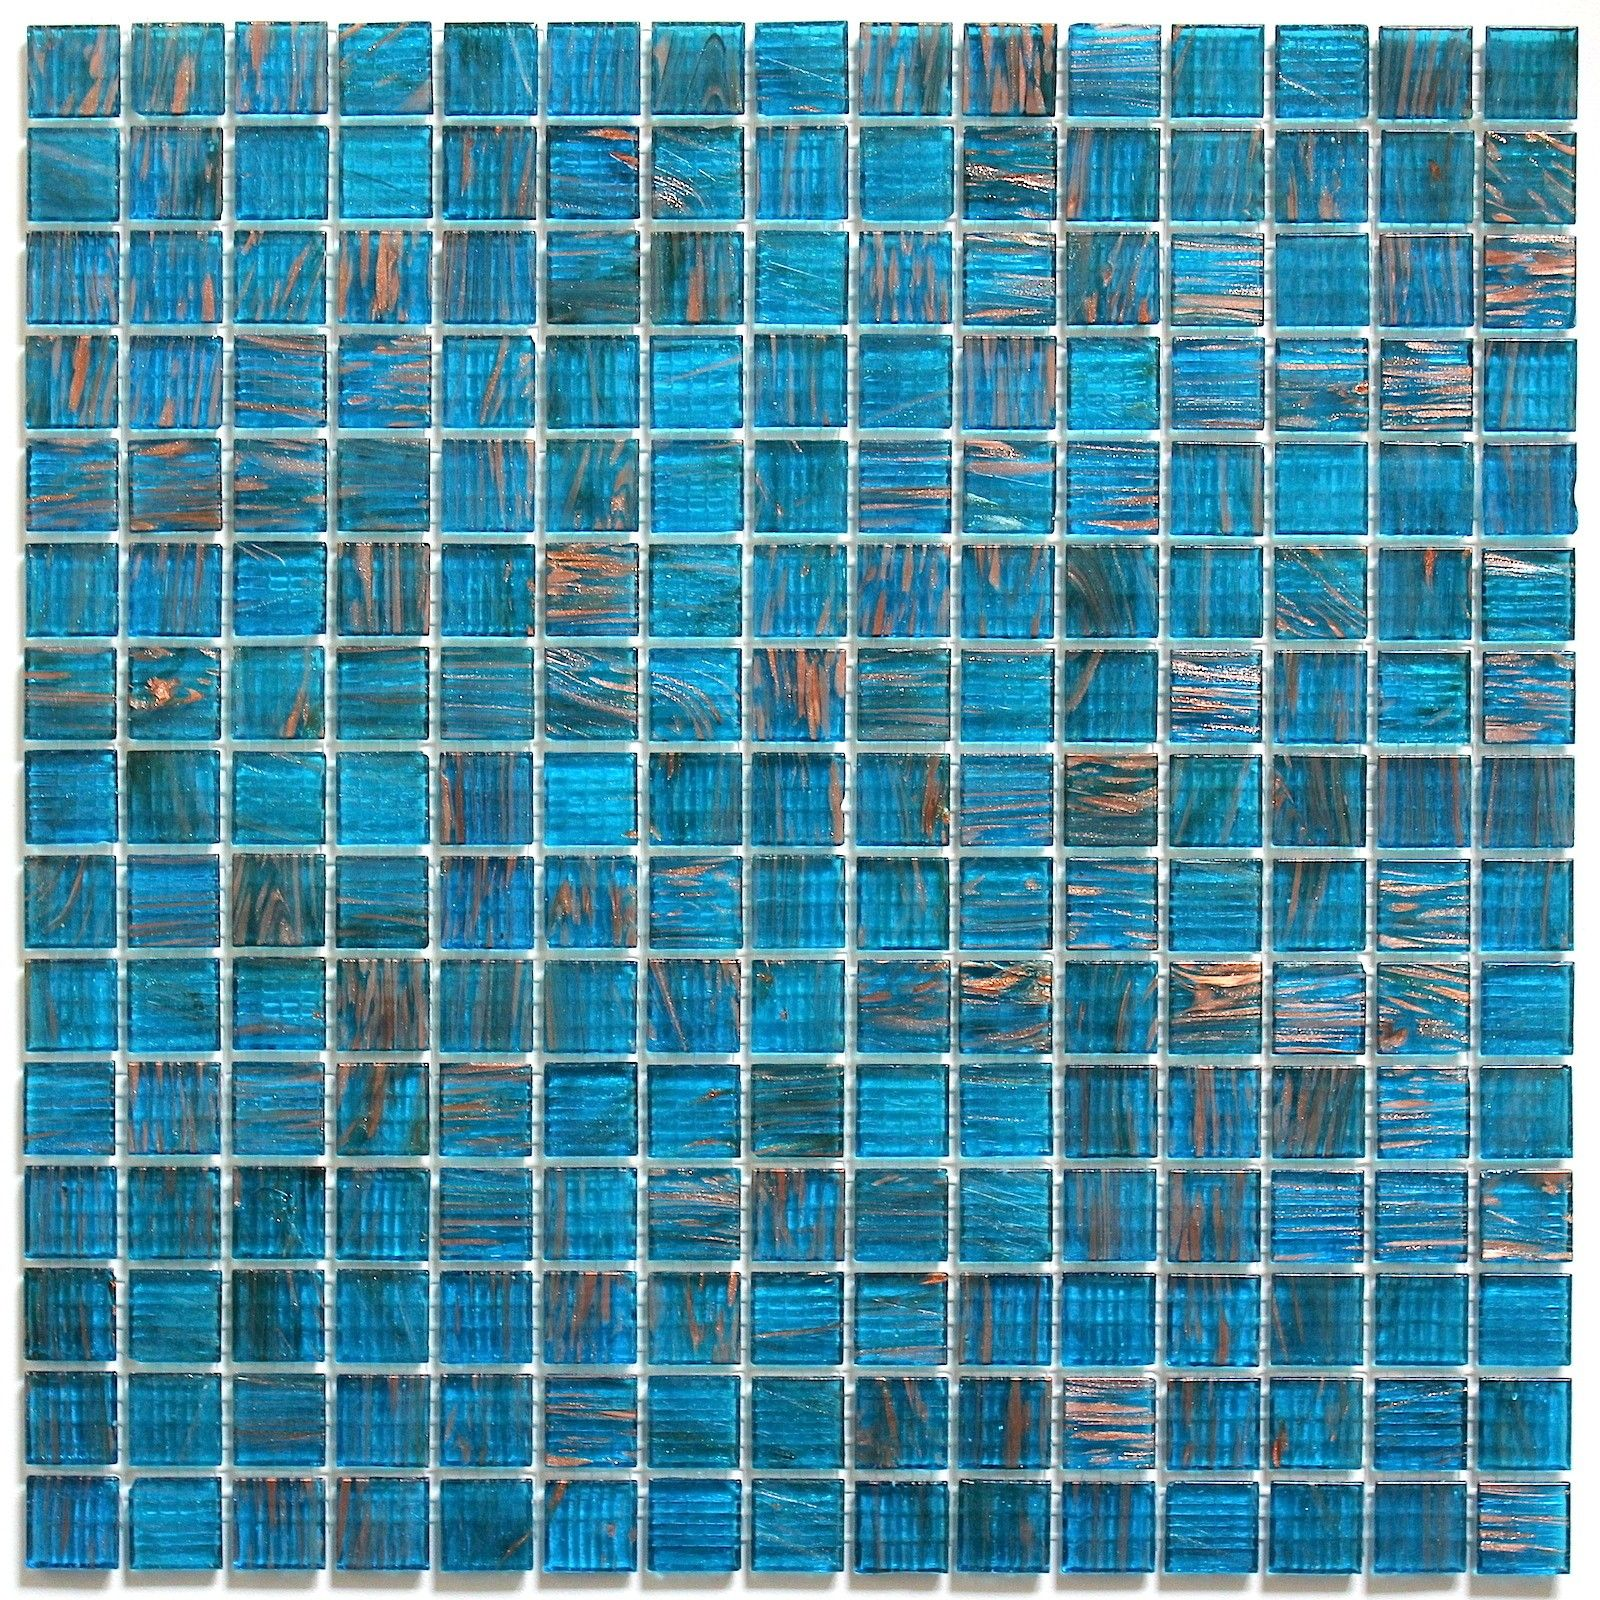 Mosaïque Piscine Salle De Bain Douche Vitro Bleu Httpwww - Salle de bain mosaique bleu